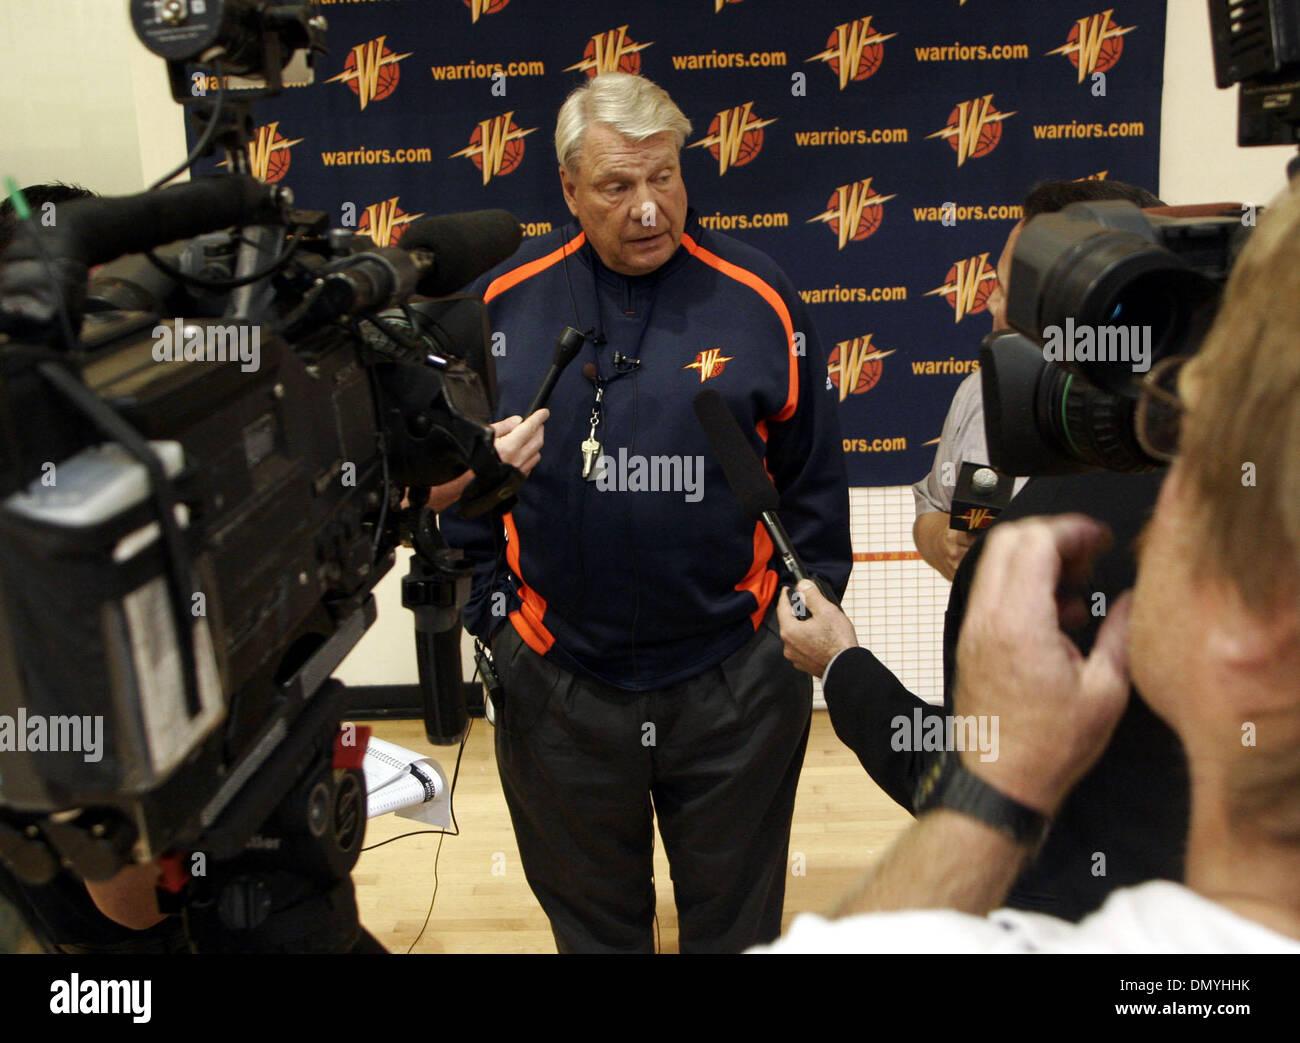 Sep 28 2006 Oakland CA USA Warrior coach DON NELSON during an